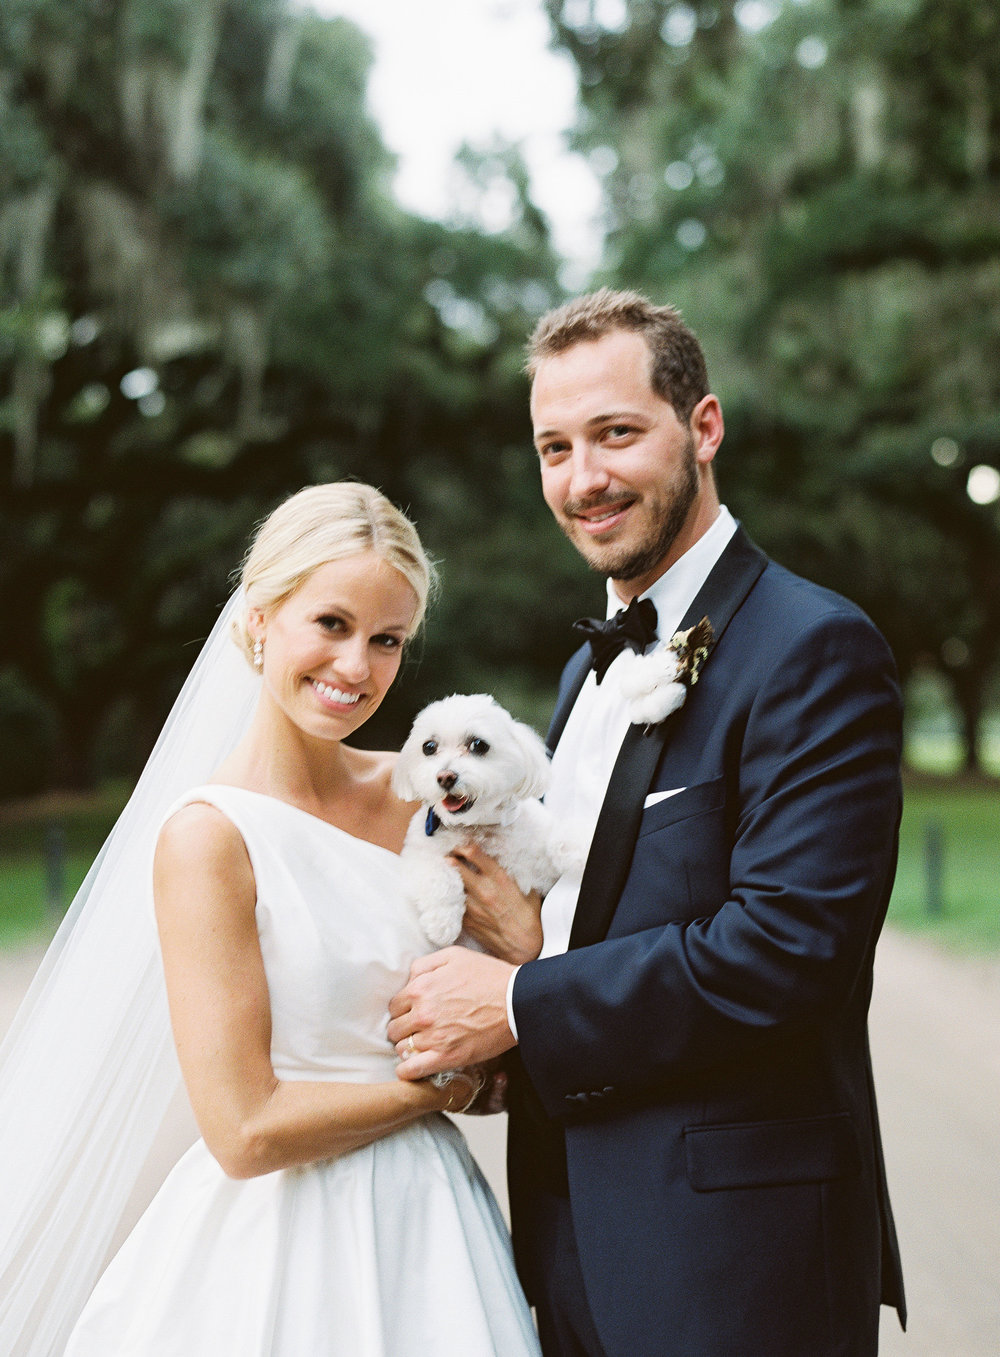 Ashley & Adam's wedding at Boone Hall Plantation by Landon Jacob